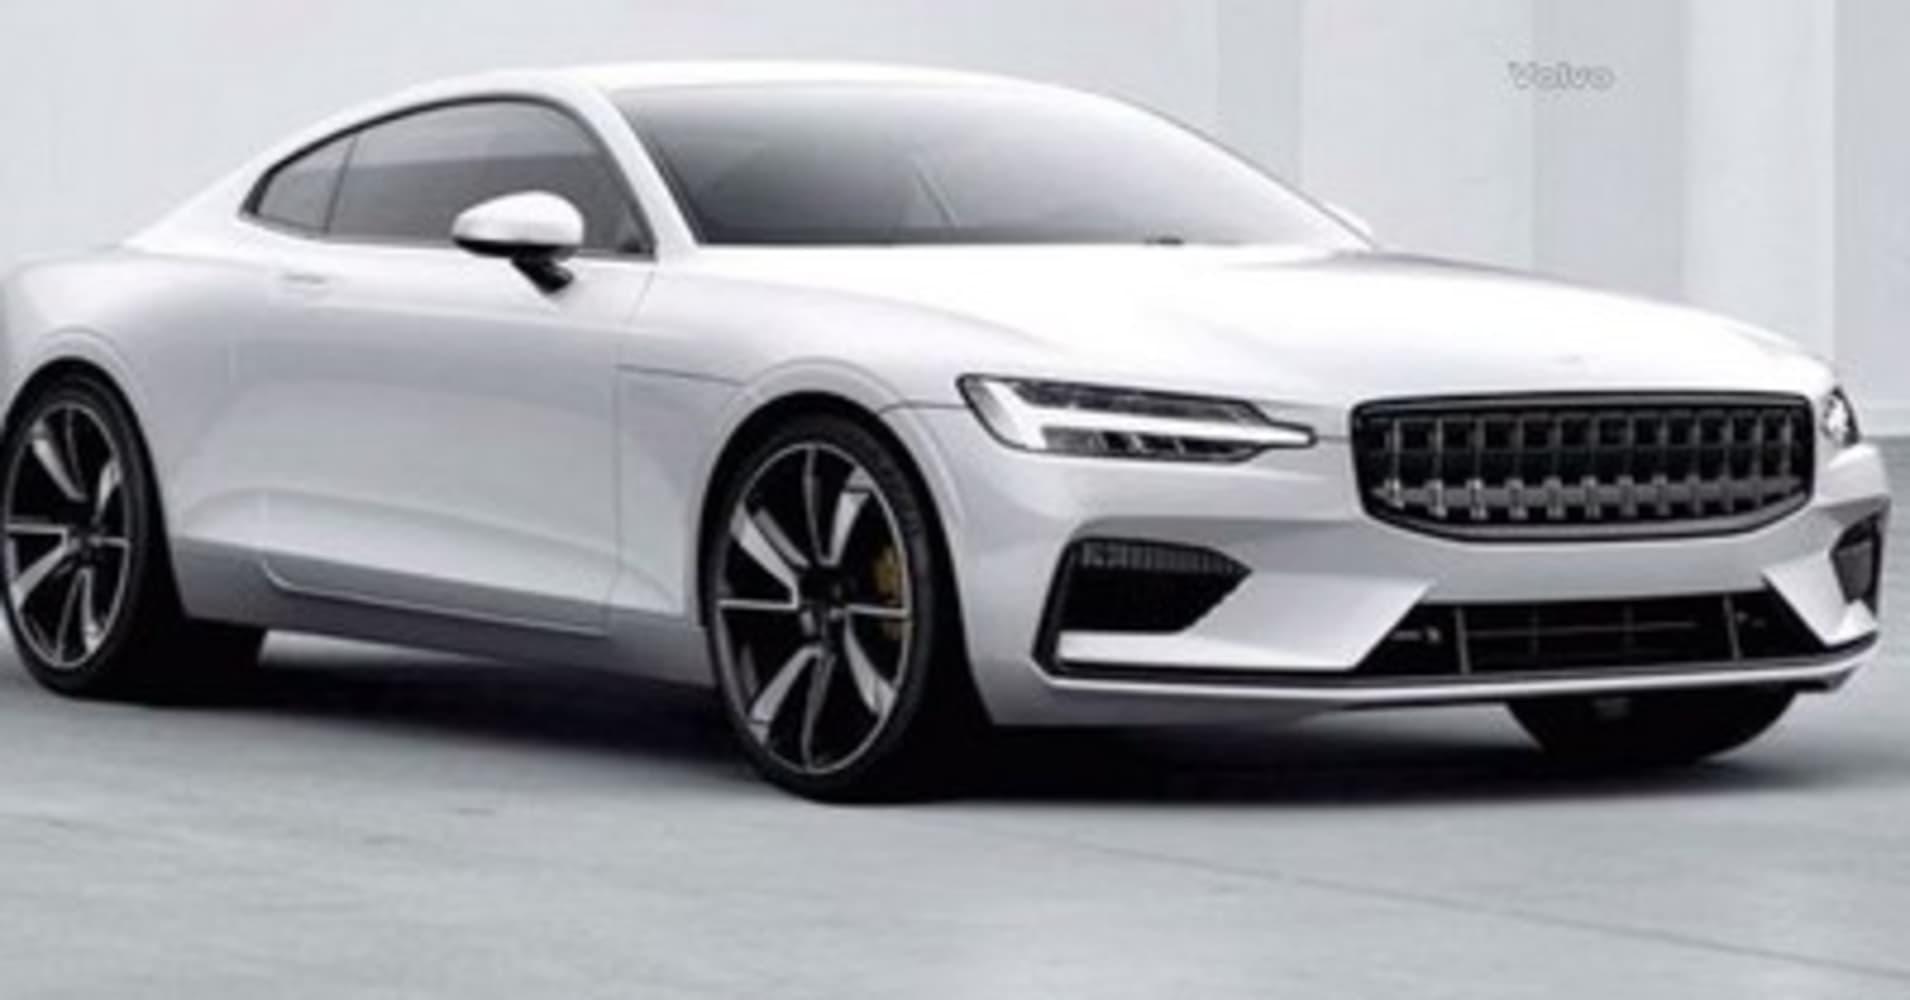 Volvo Unveils Polestar 1 Electric Sports Coupe, Its Bid To Take On Tesla